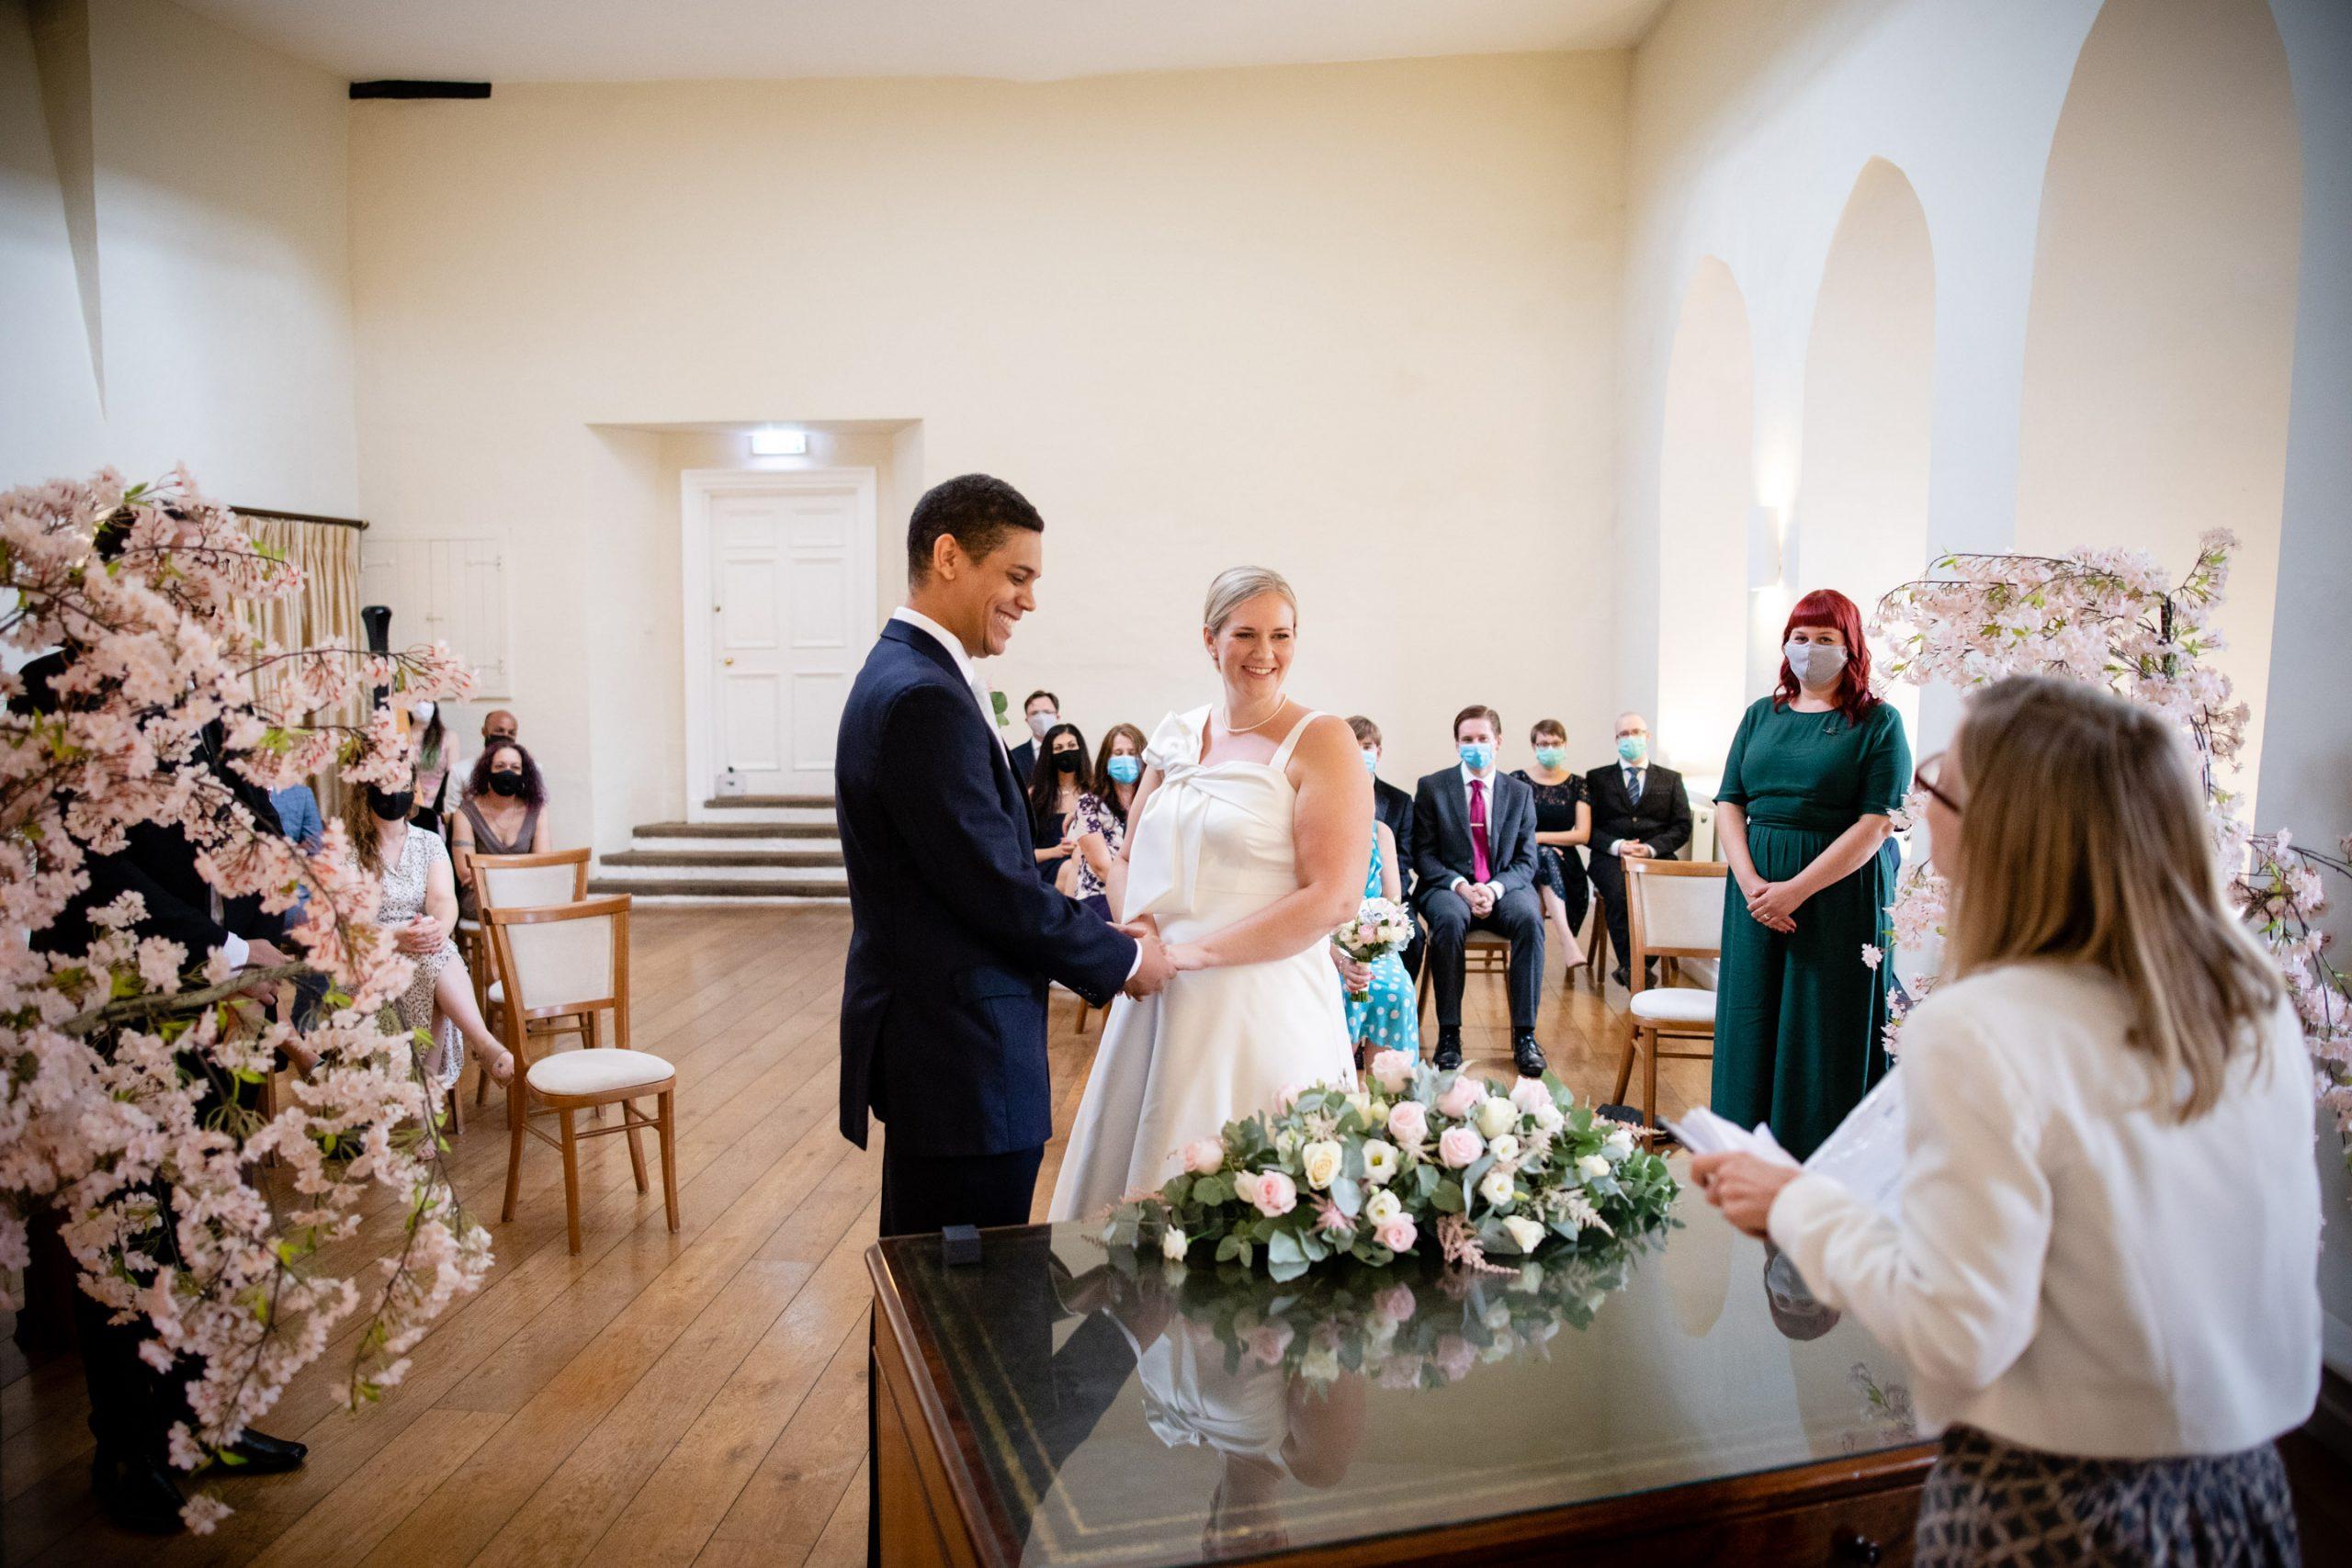 Catherine & Jason's COVID wedding at Farnham Castle taking place in the Lantern Hall.